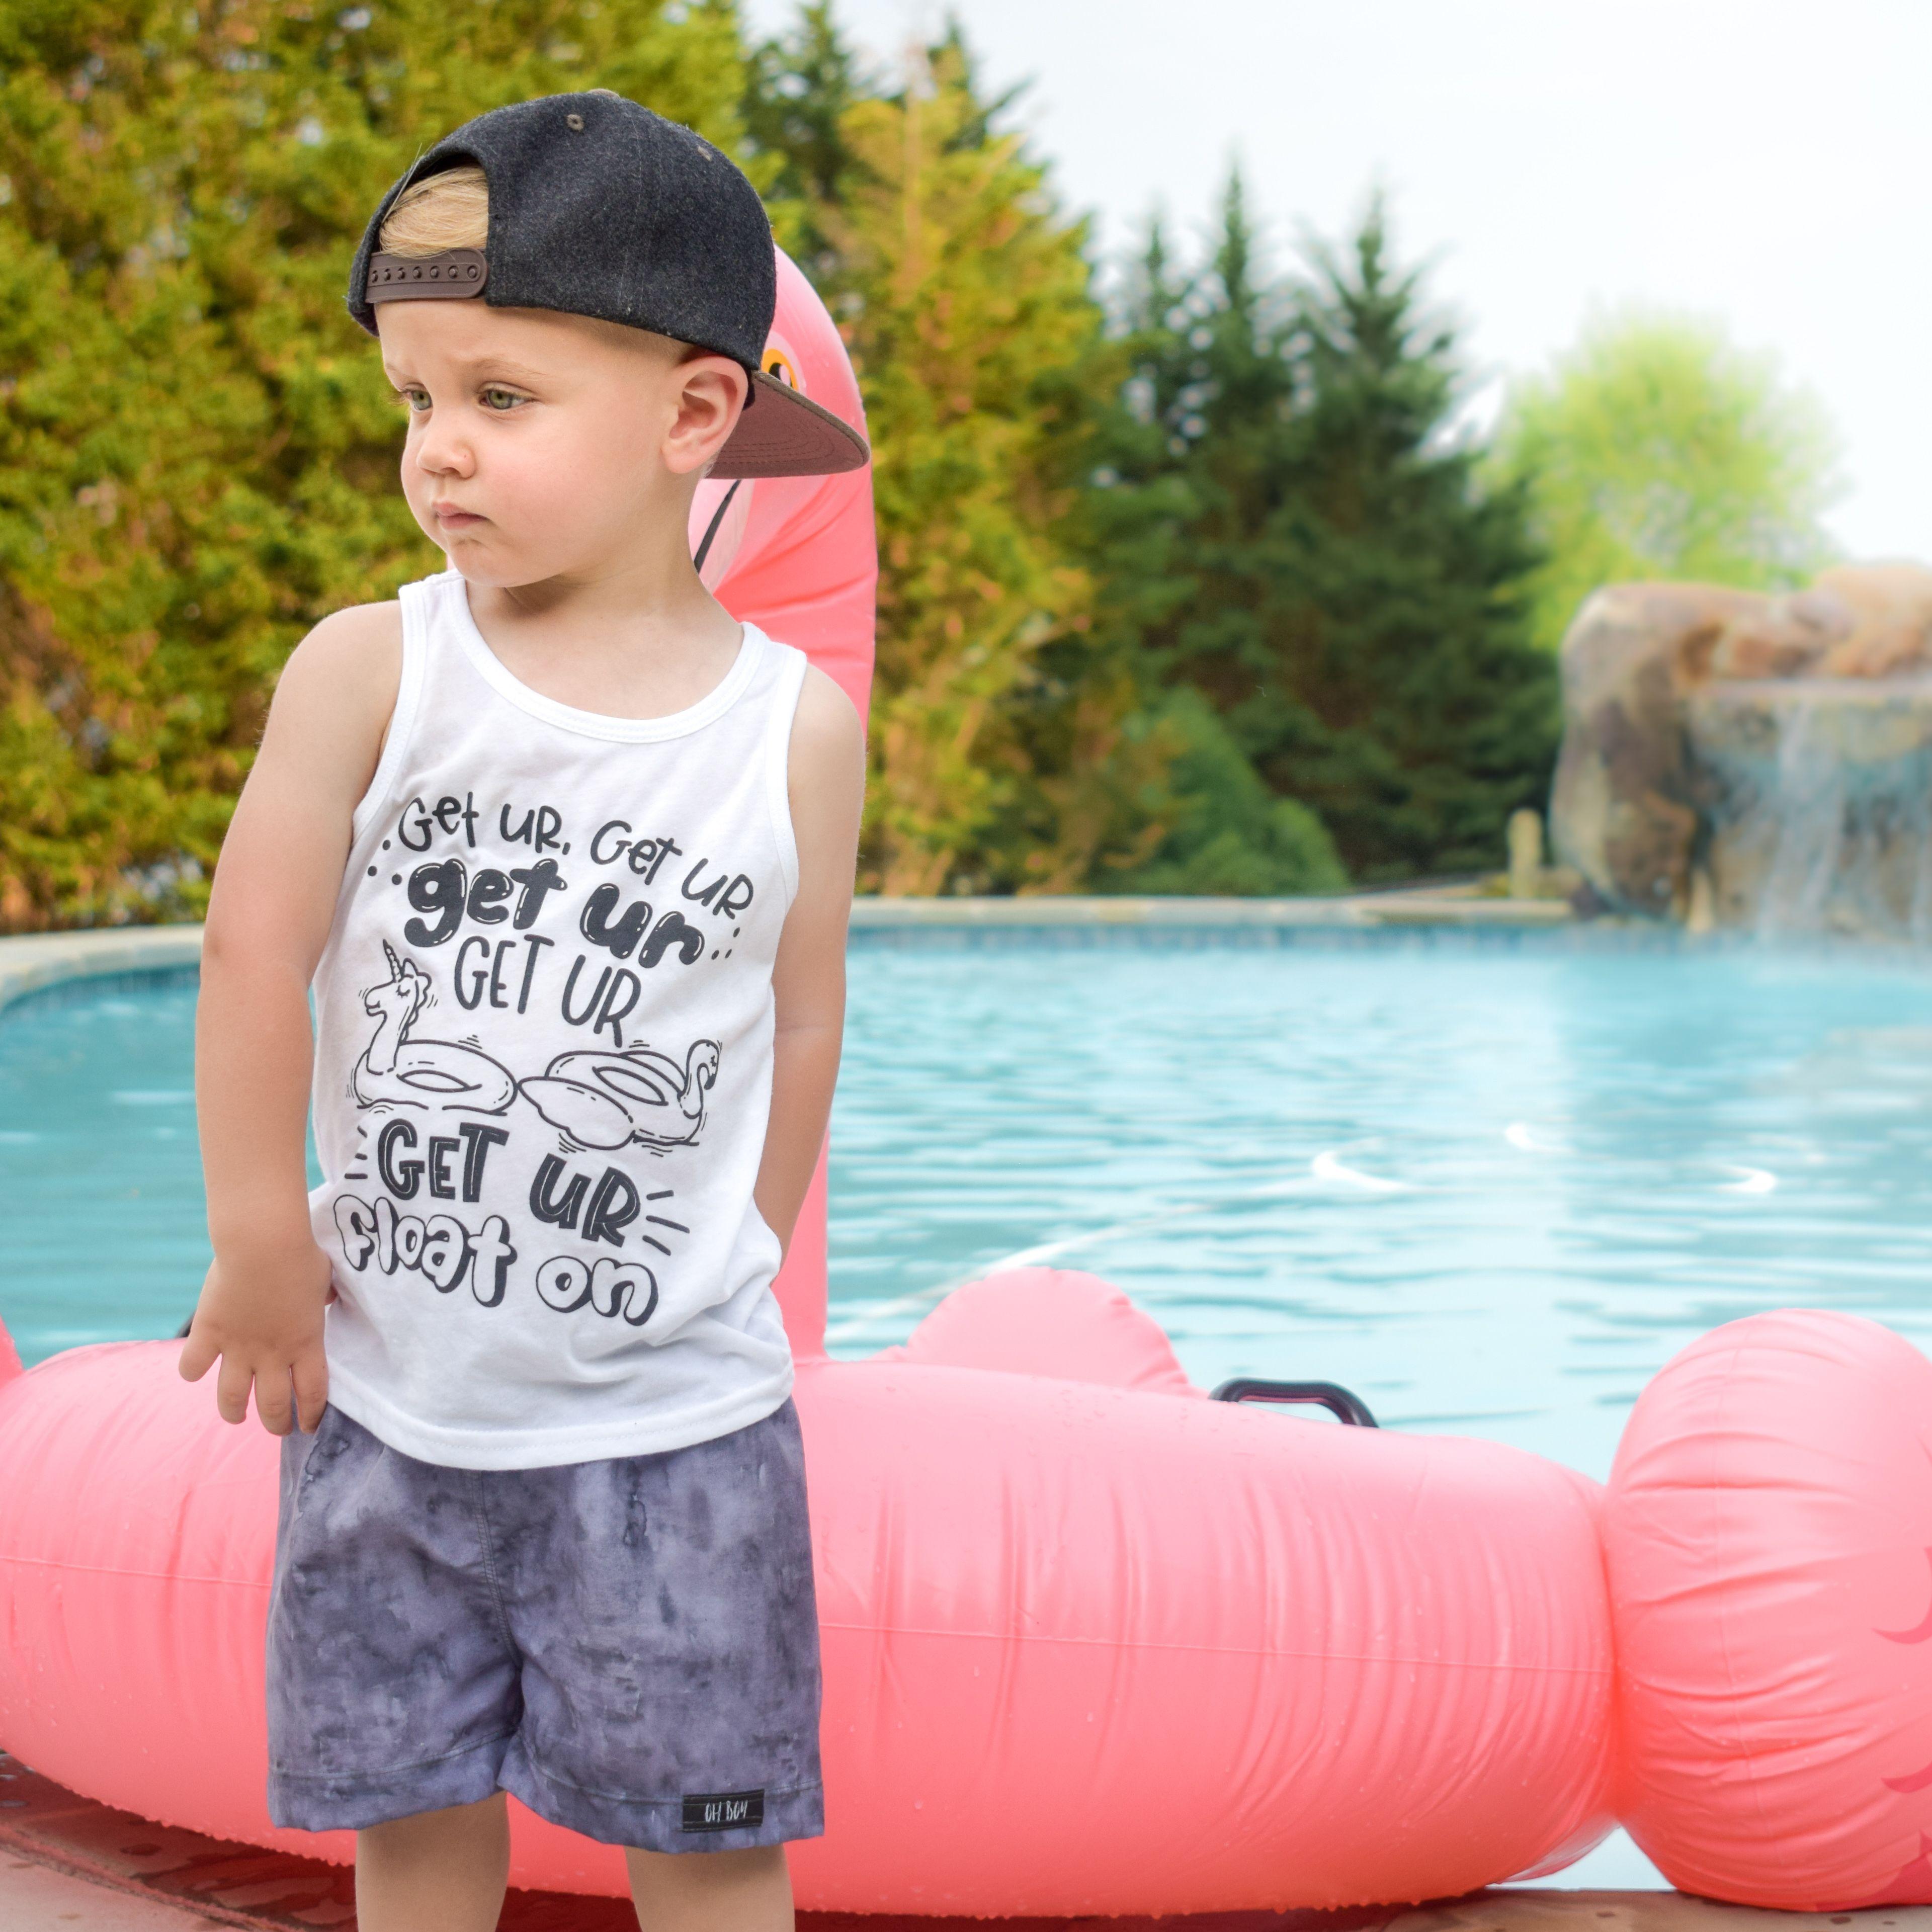 96276442f Summer shirt - flamingo float shirt - pool shirt - trendy kids clothes - boy  clothes - baby girl shirt